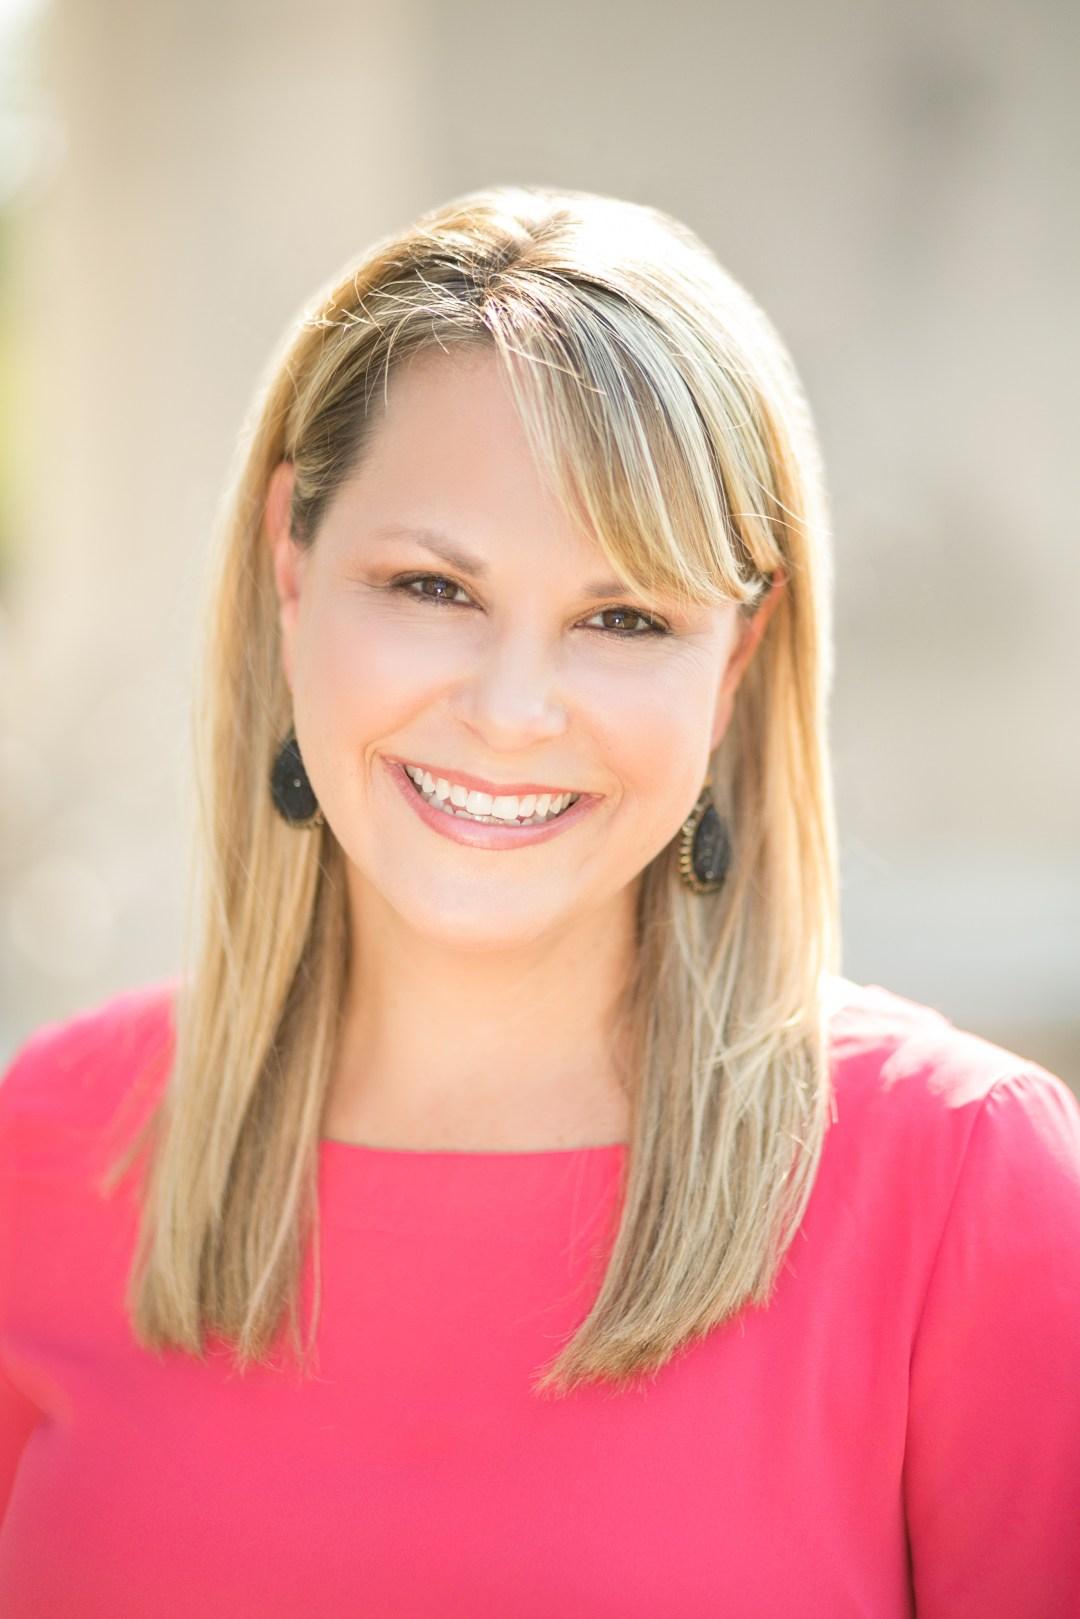 Kim-Becking-Looking-Forward-Living-Life-Coach-Divorce-Author-Speaker-Headshot-1